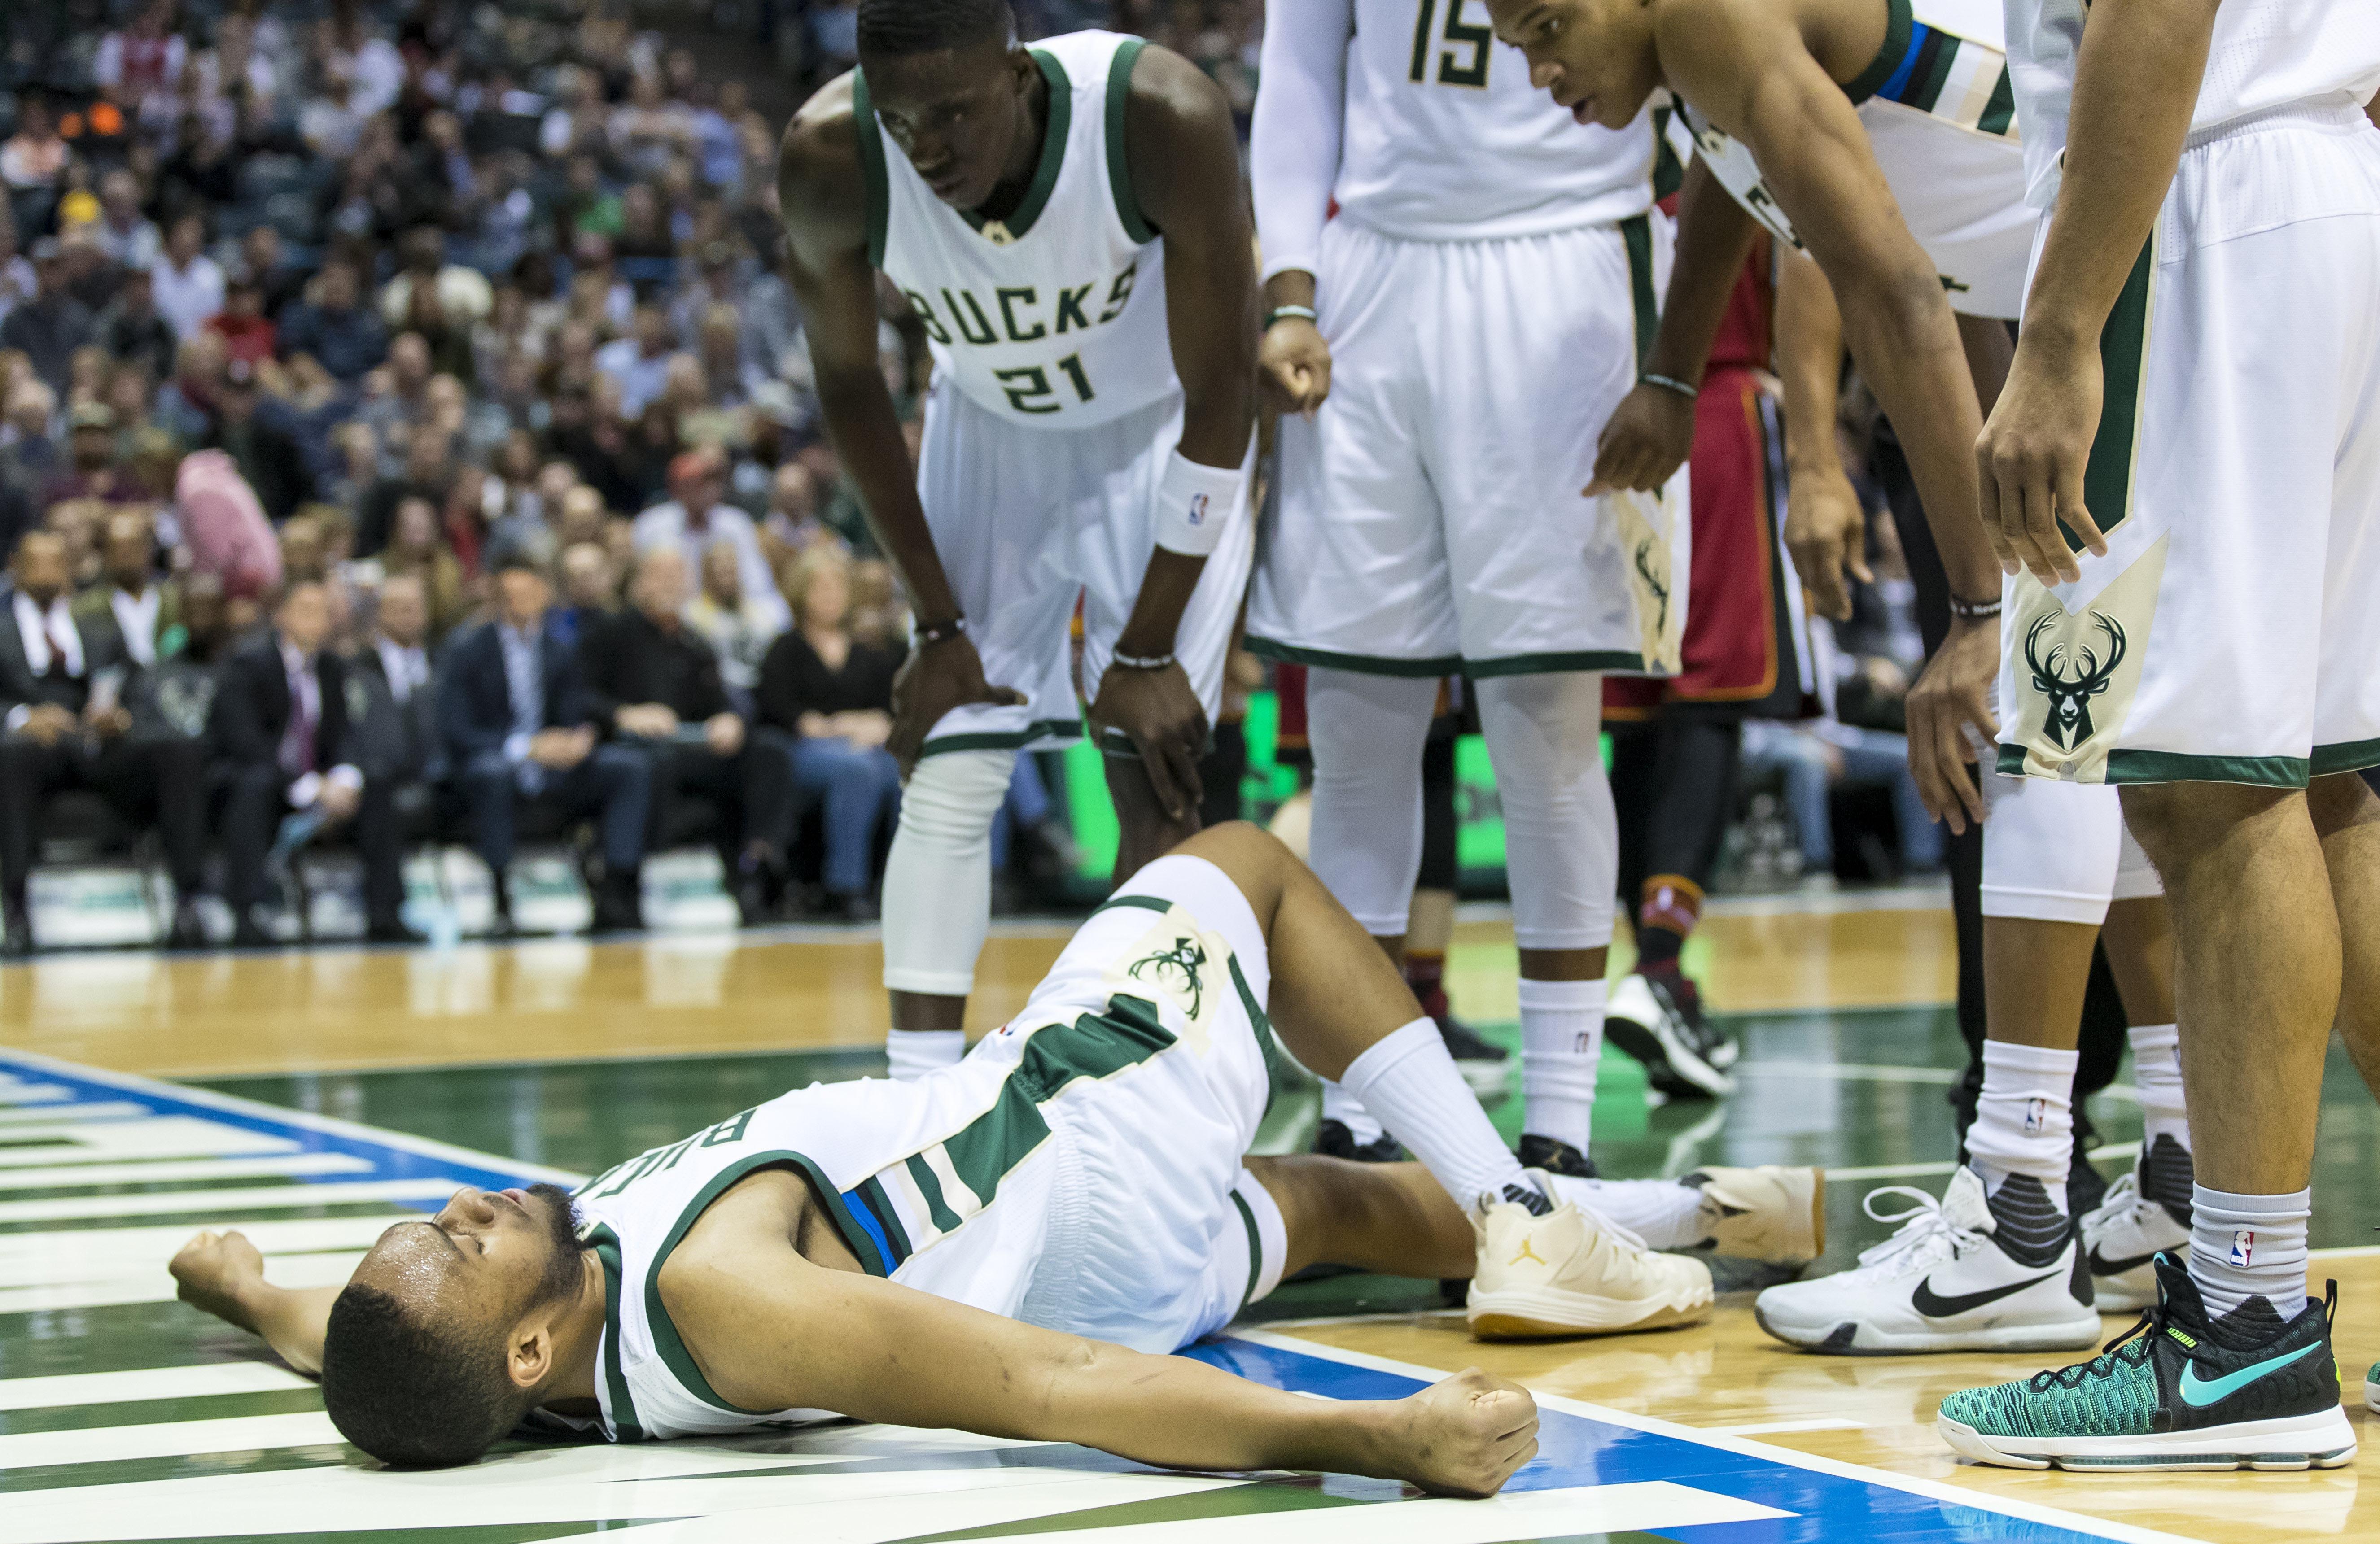 Milwaukee Bucks Daily: Jabari Parker Injured, Oshkosh D-League Announcement